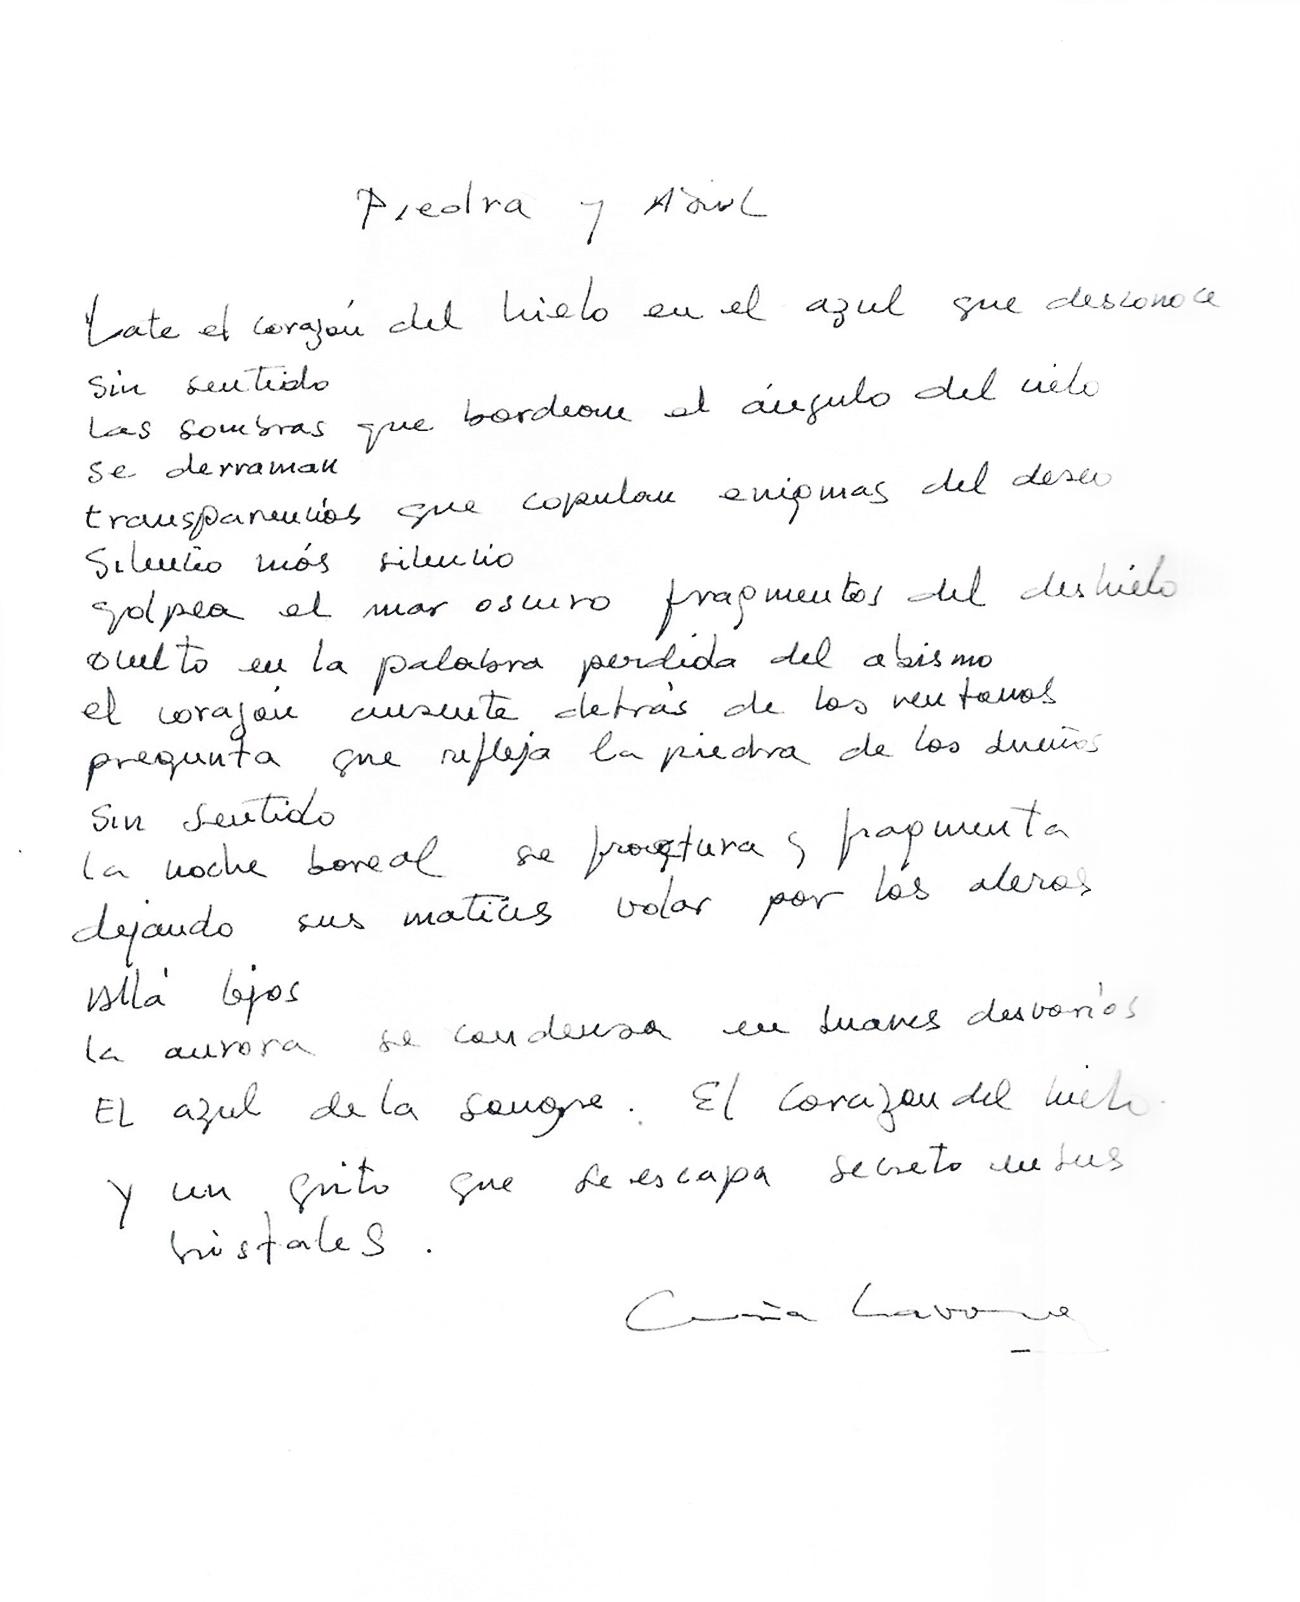 María Navarro - Como dos gotas de poesía   - Como dos gotas de poesía, fotografías de LaraBisbe